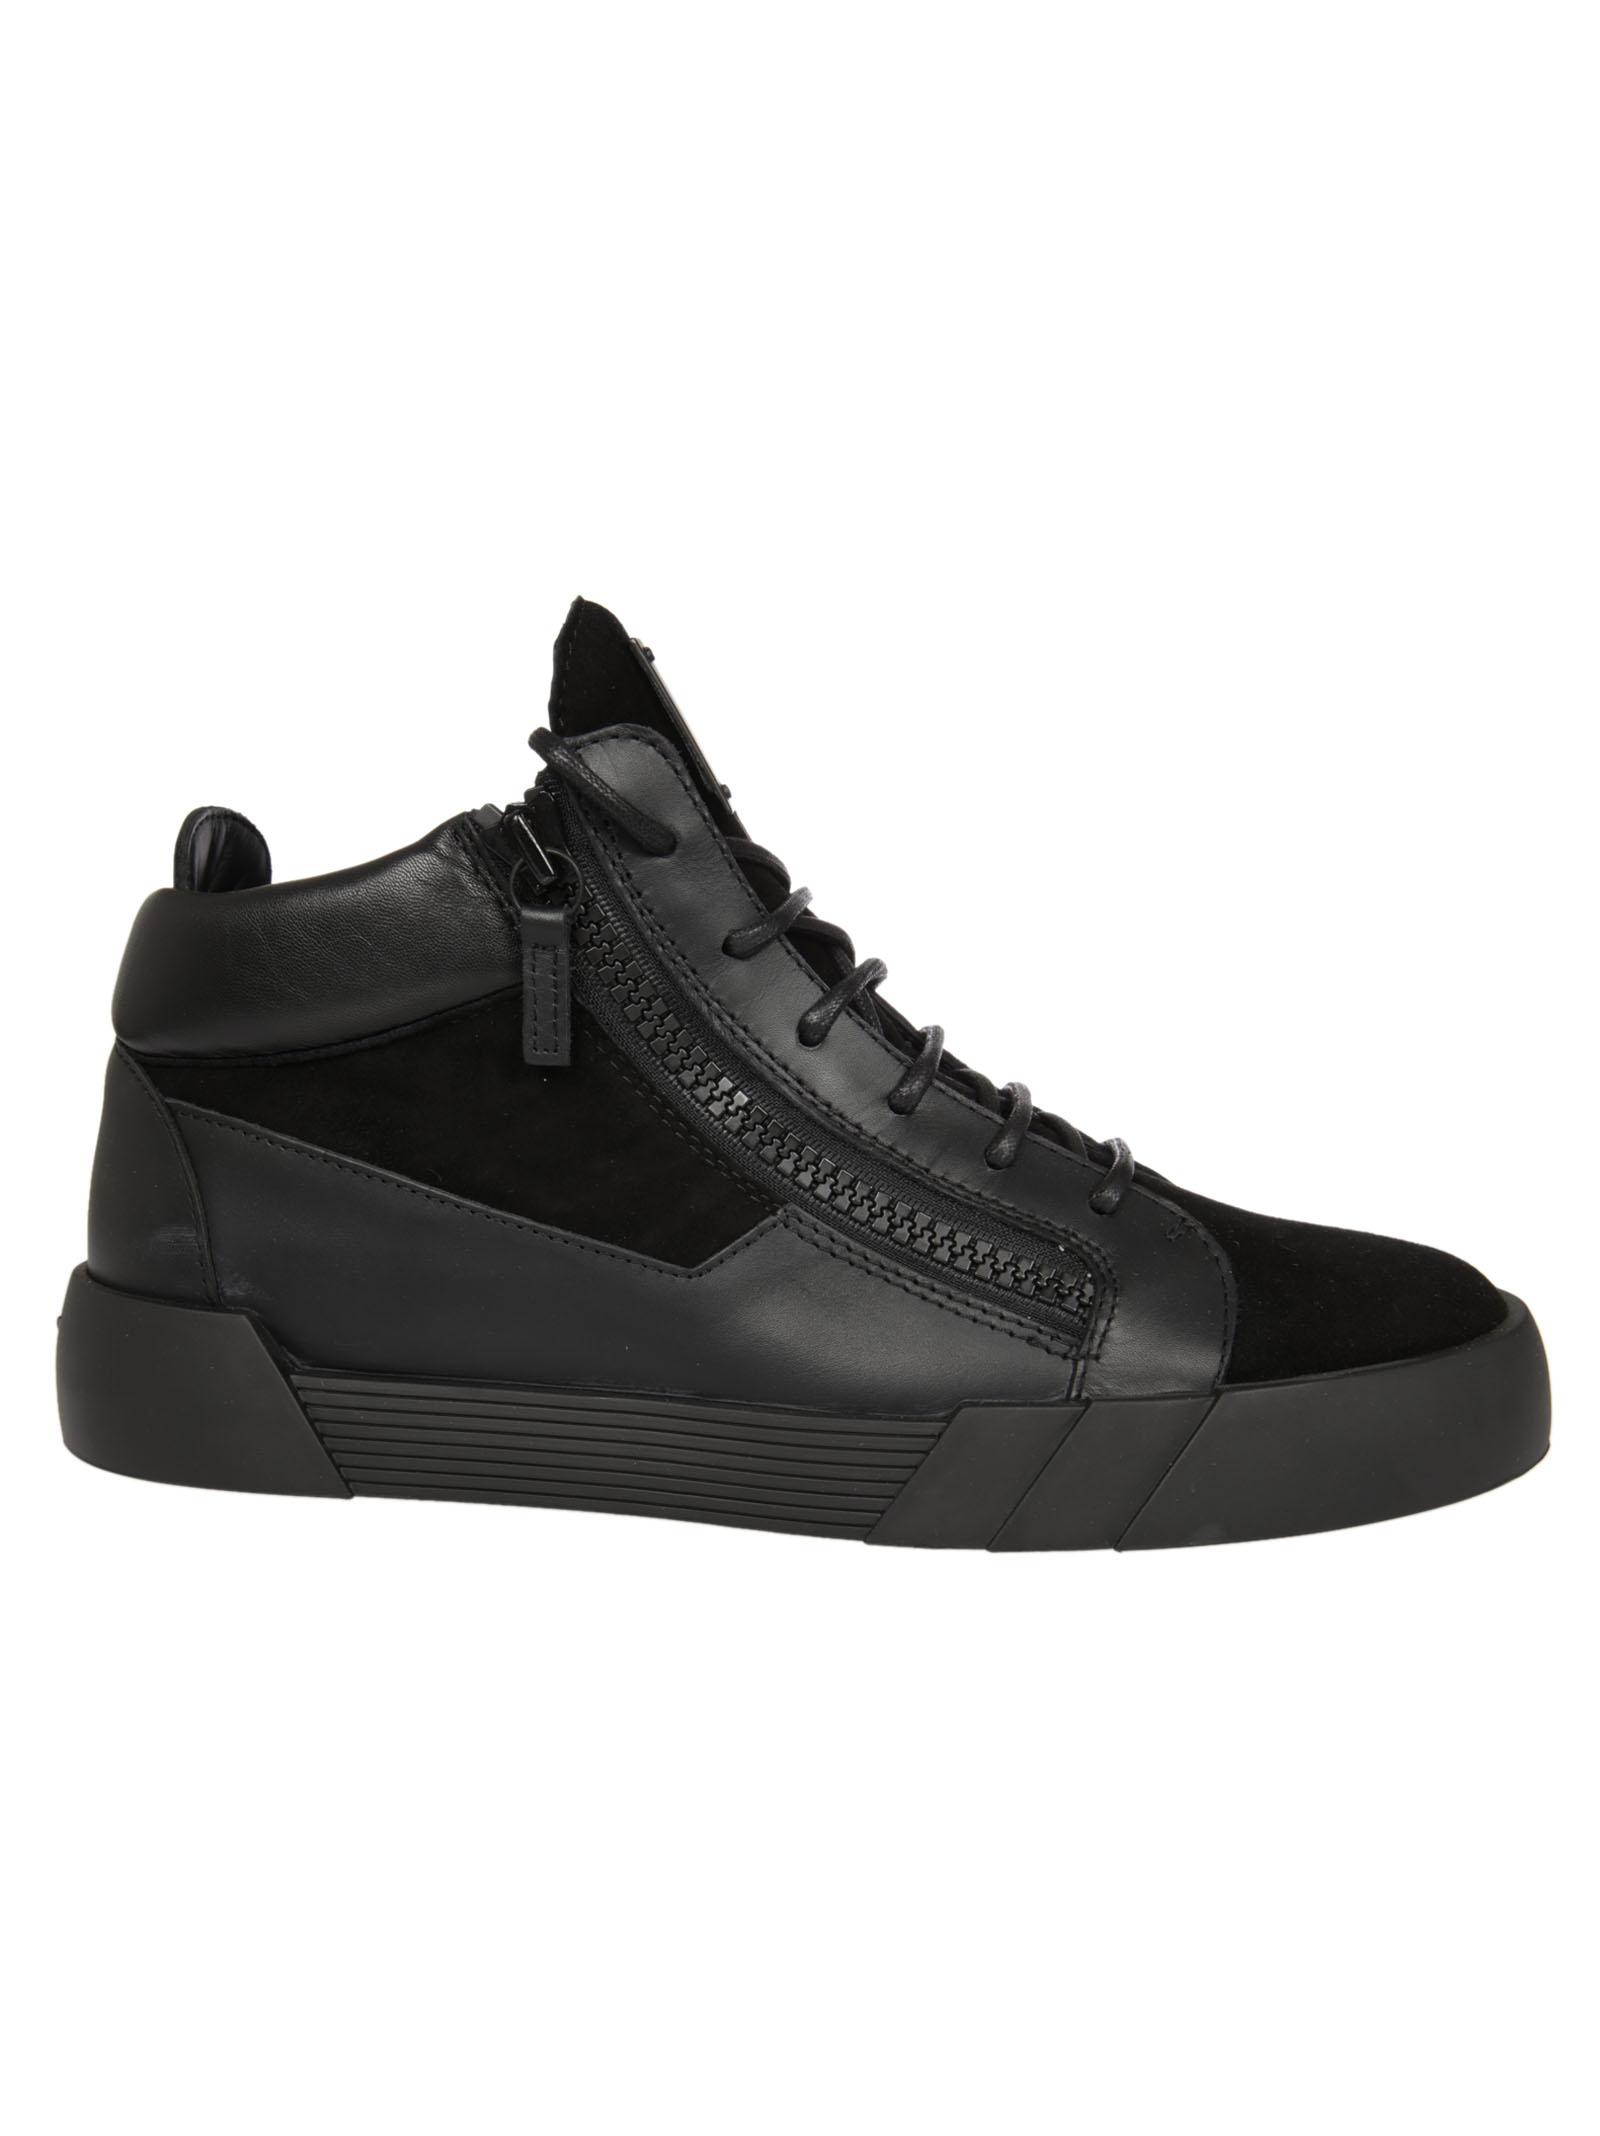 Giuseppe Zanotti Giuseppe Zanotti Camfiam Hi-Top Sneakers